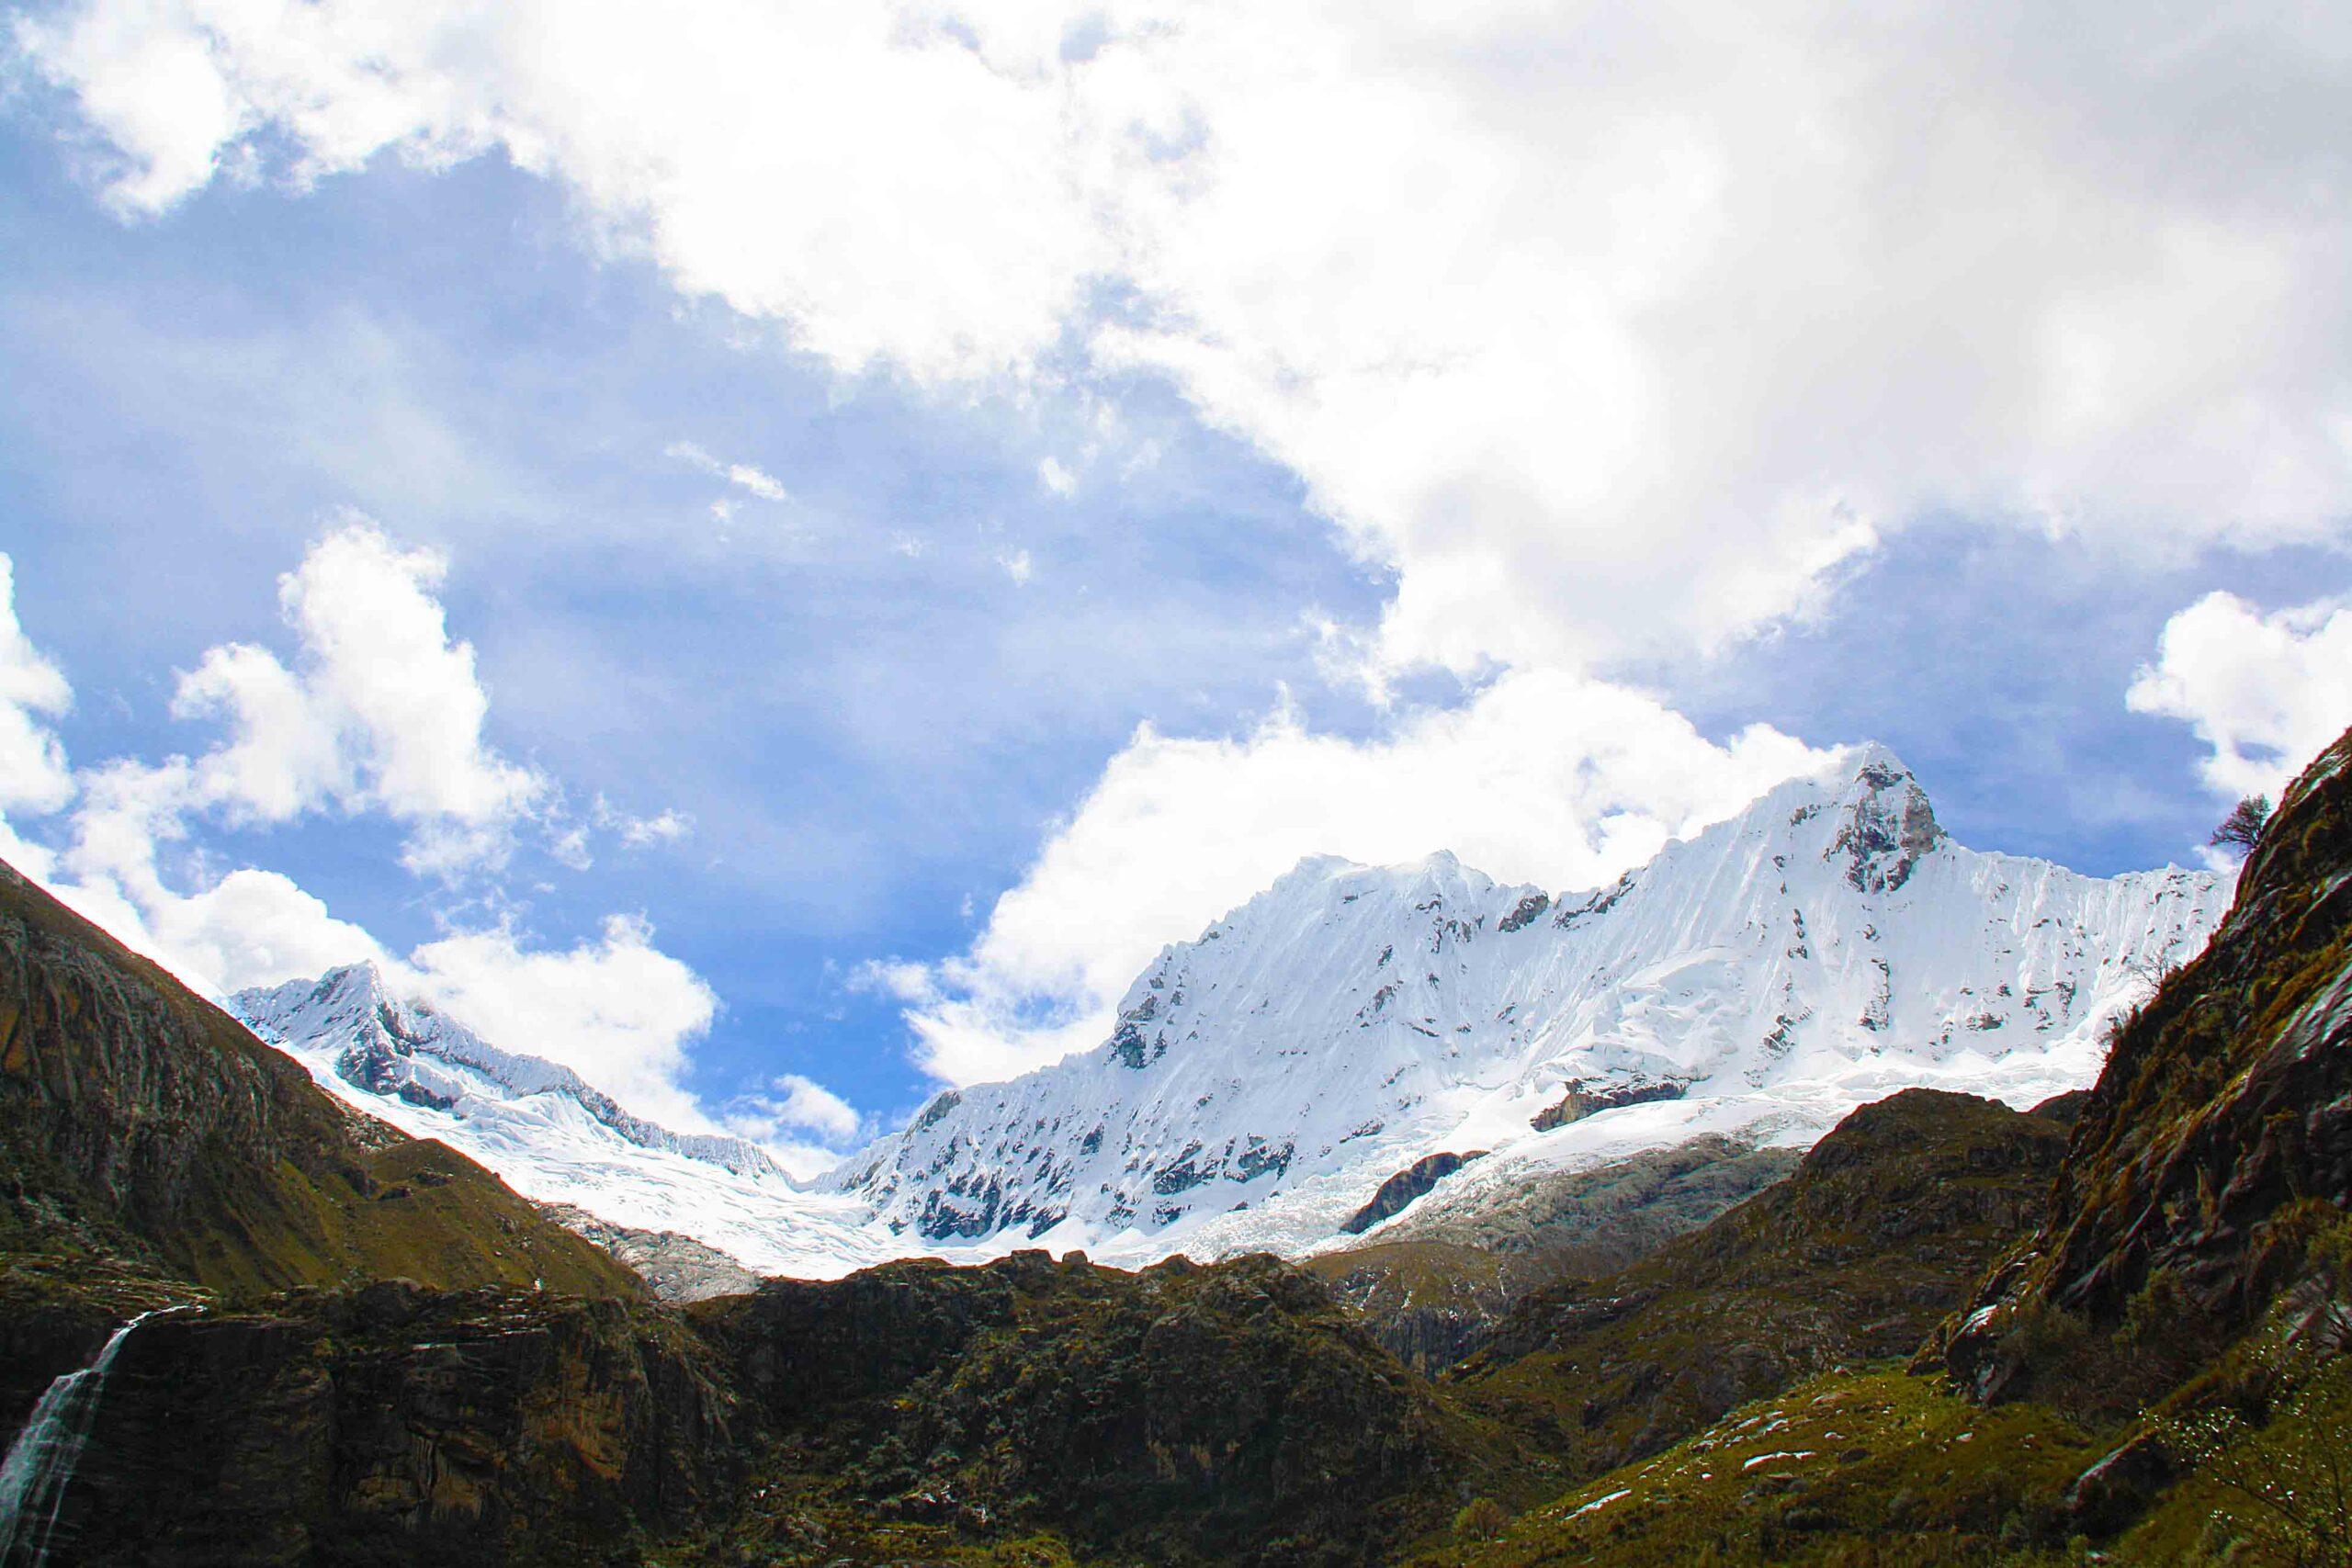 snowcapped mountains of the cordillera blanca